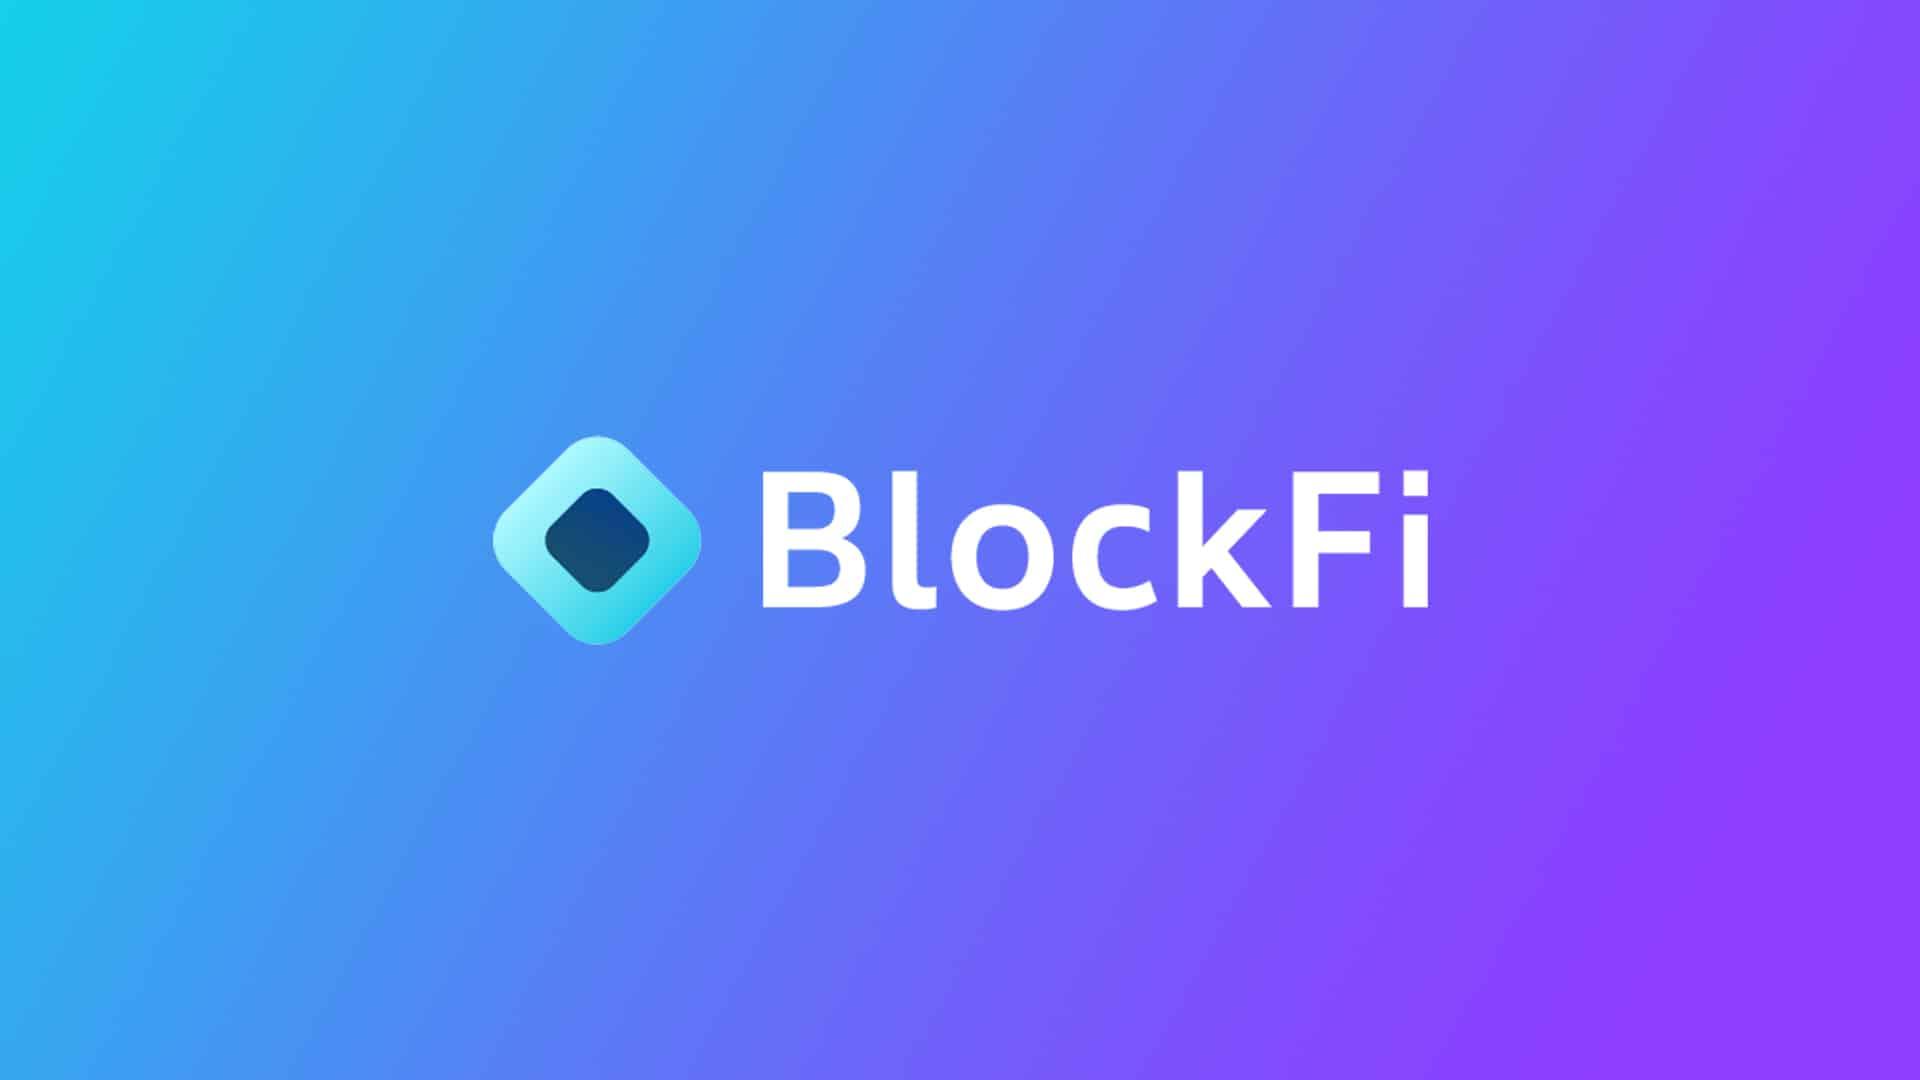 BlockFi raccoglie fondi per 30 milioni di dollari